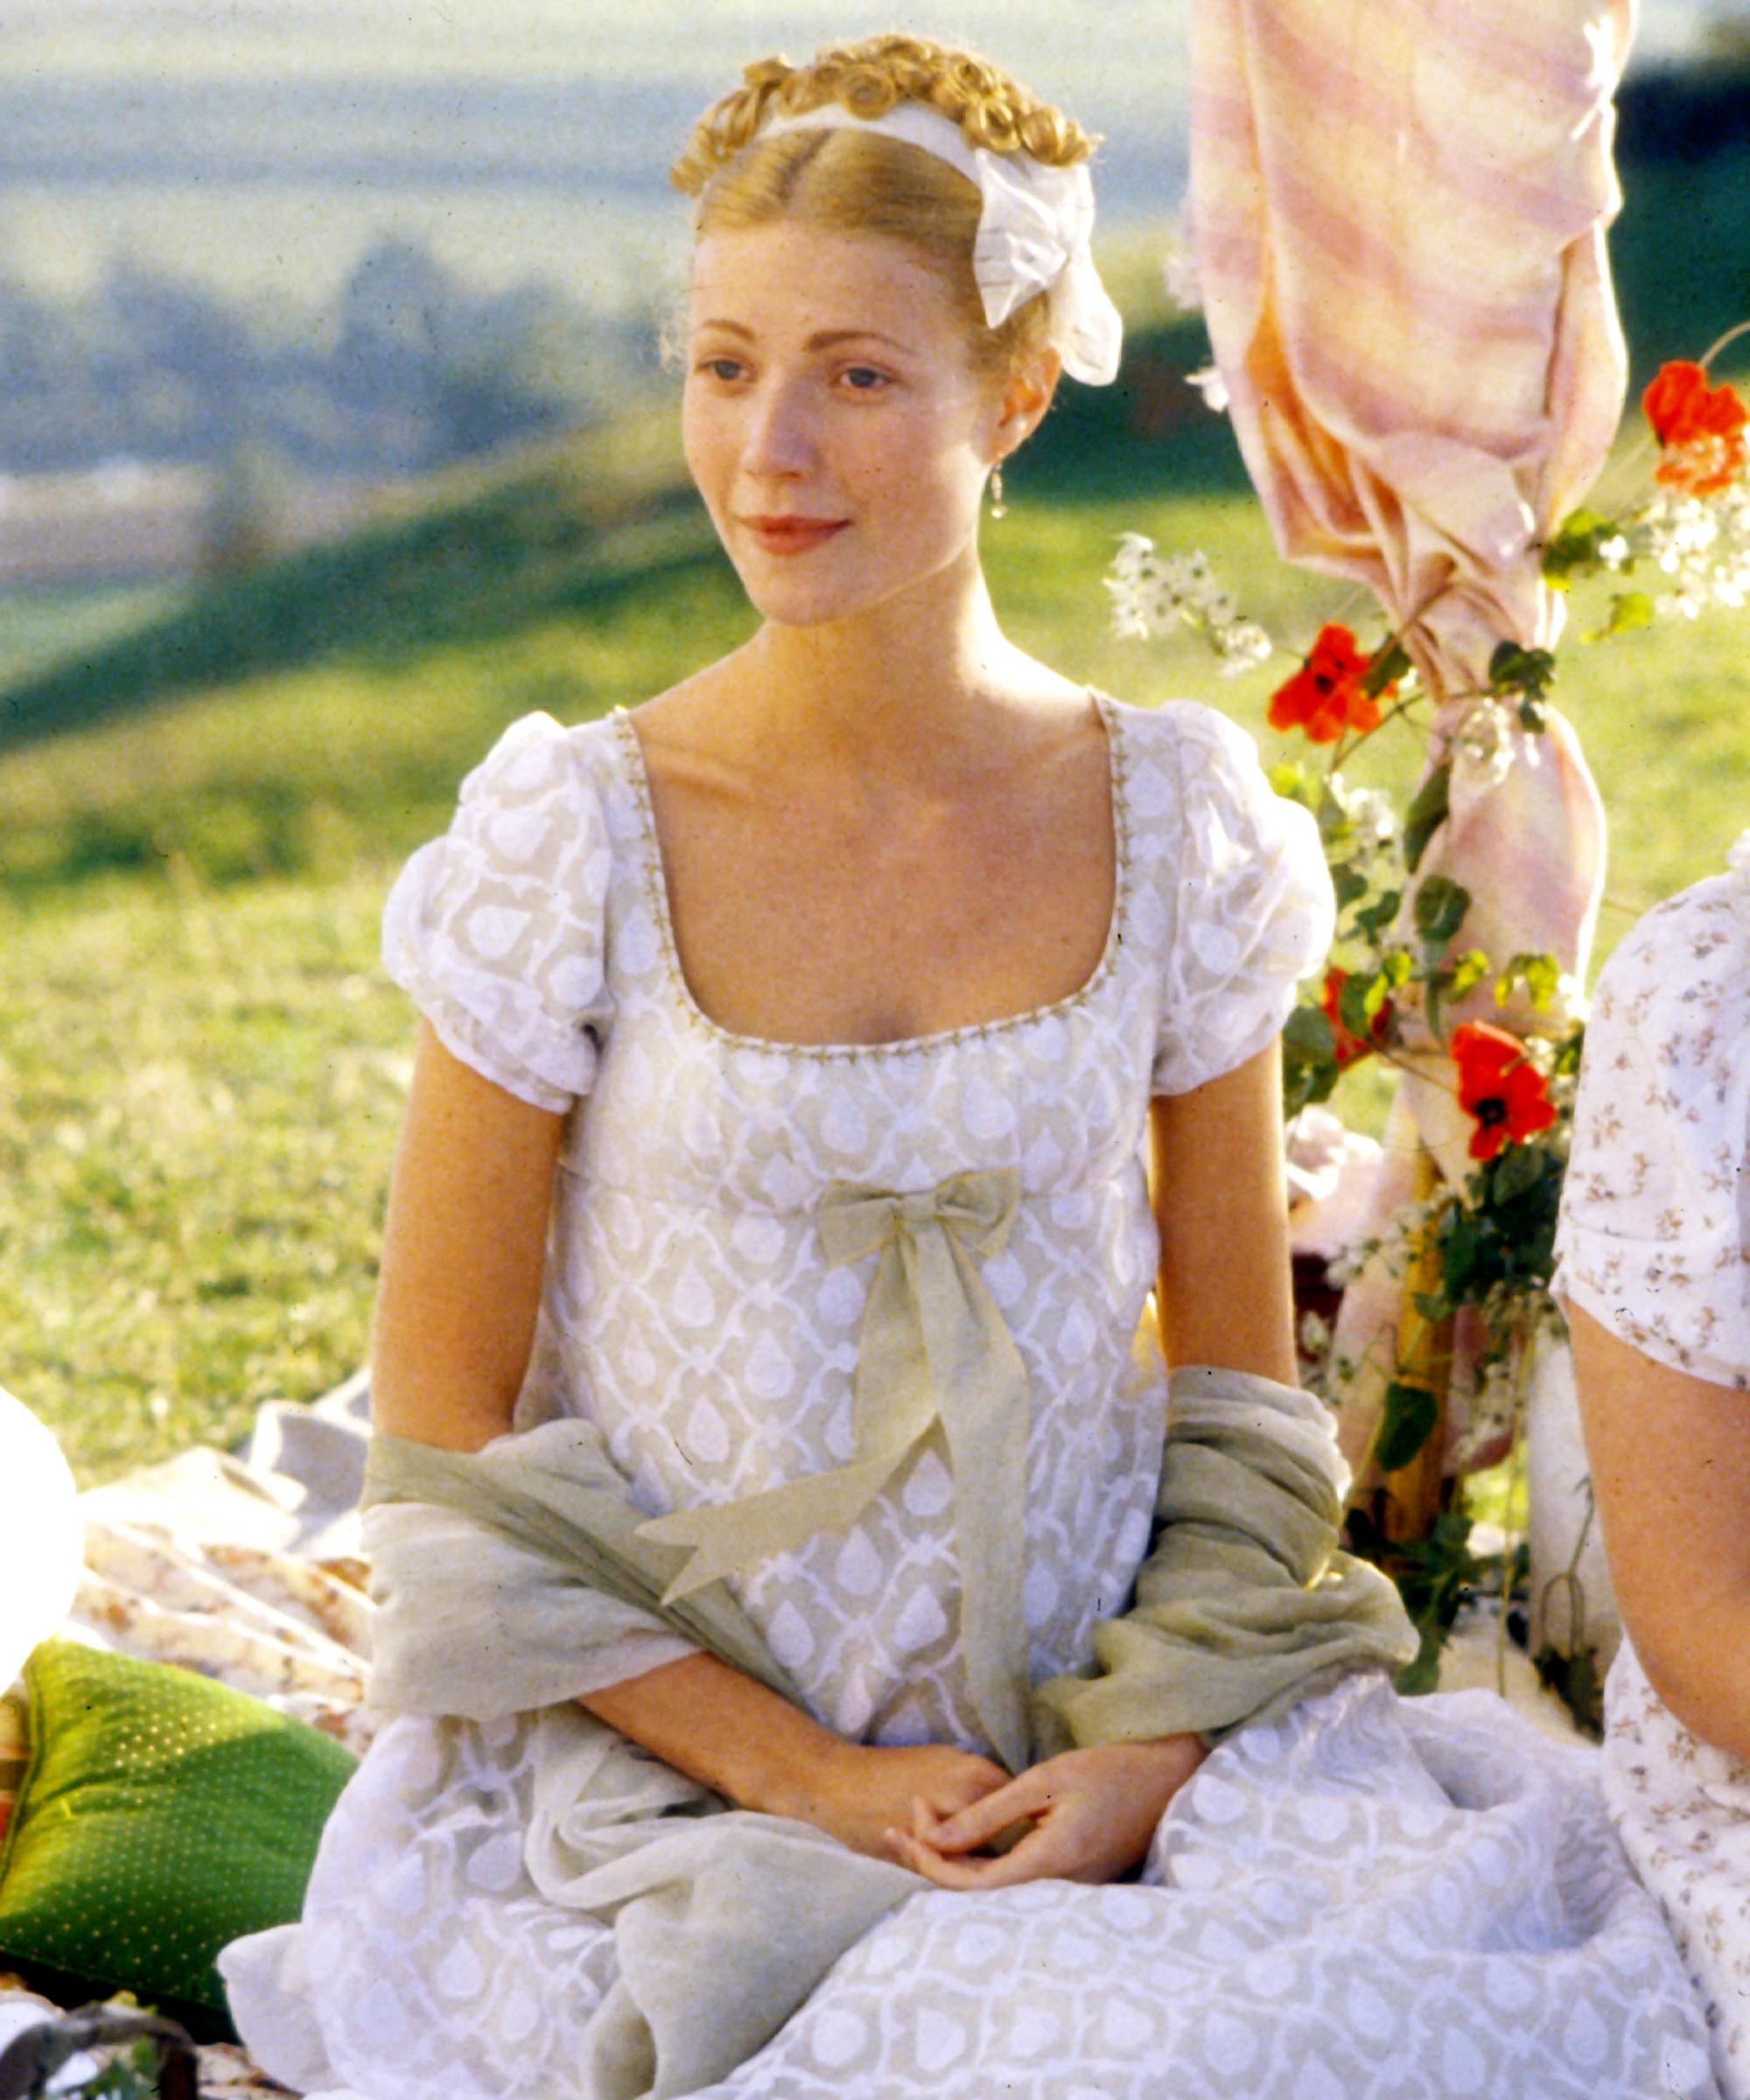 Gwyneth Paltrow Movies Emma 1996 Her Best Performance